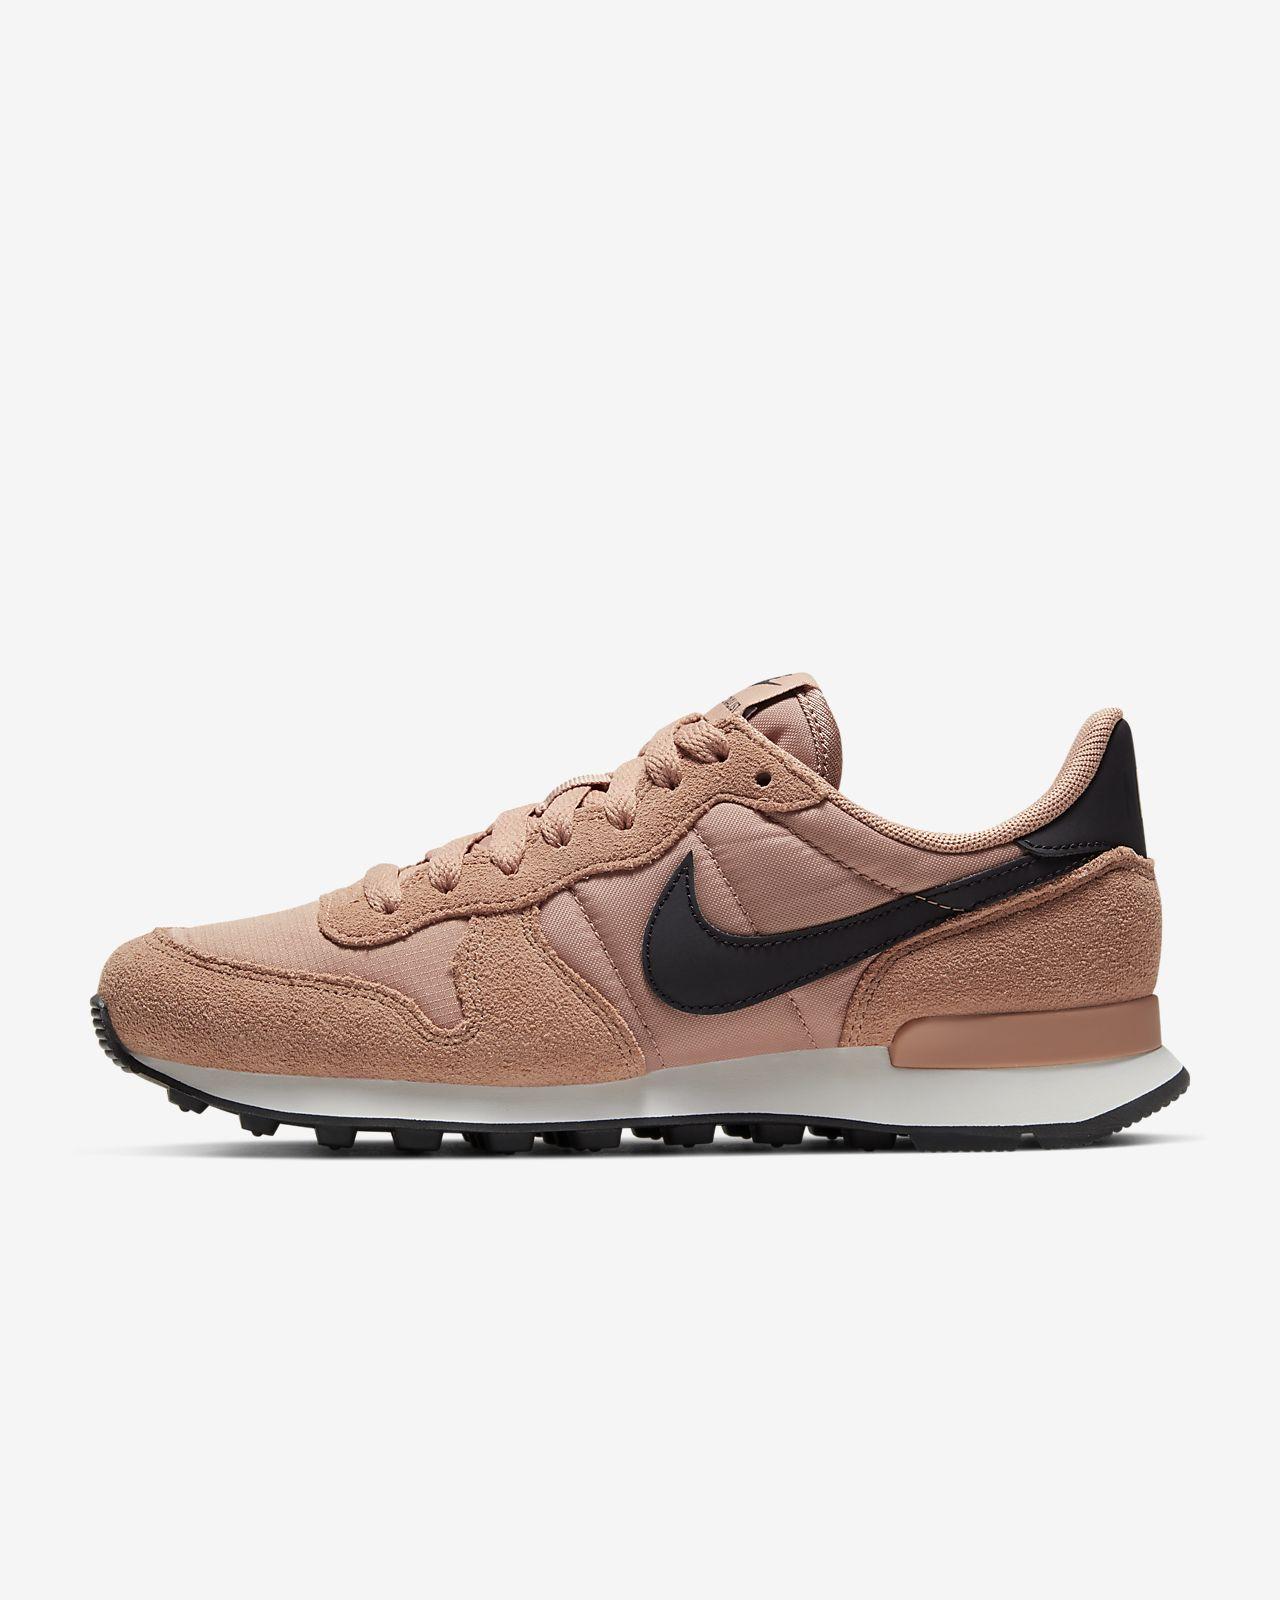 sale retailer bcb6a a4973 Low Resolution Nike Internationalist Zapatillas - Mujer Nike  Internationalist Zapatillas - Mujer